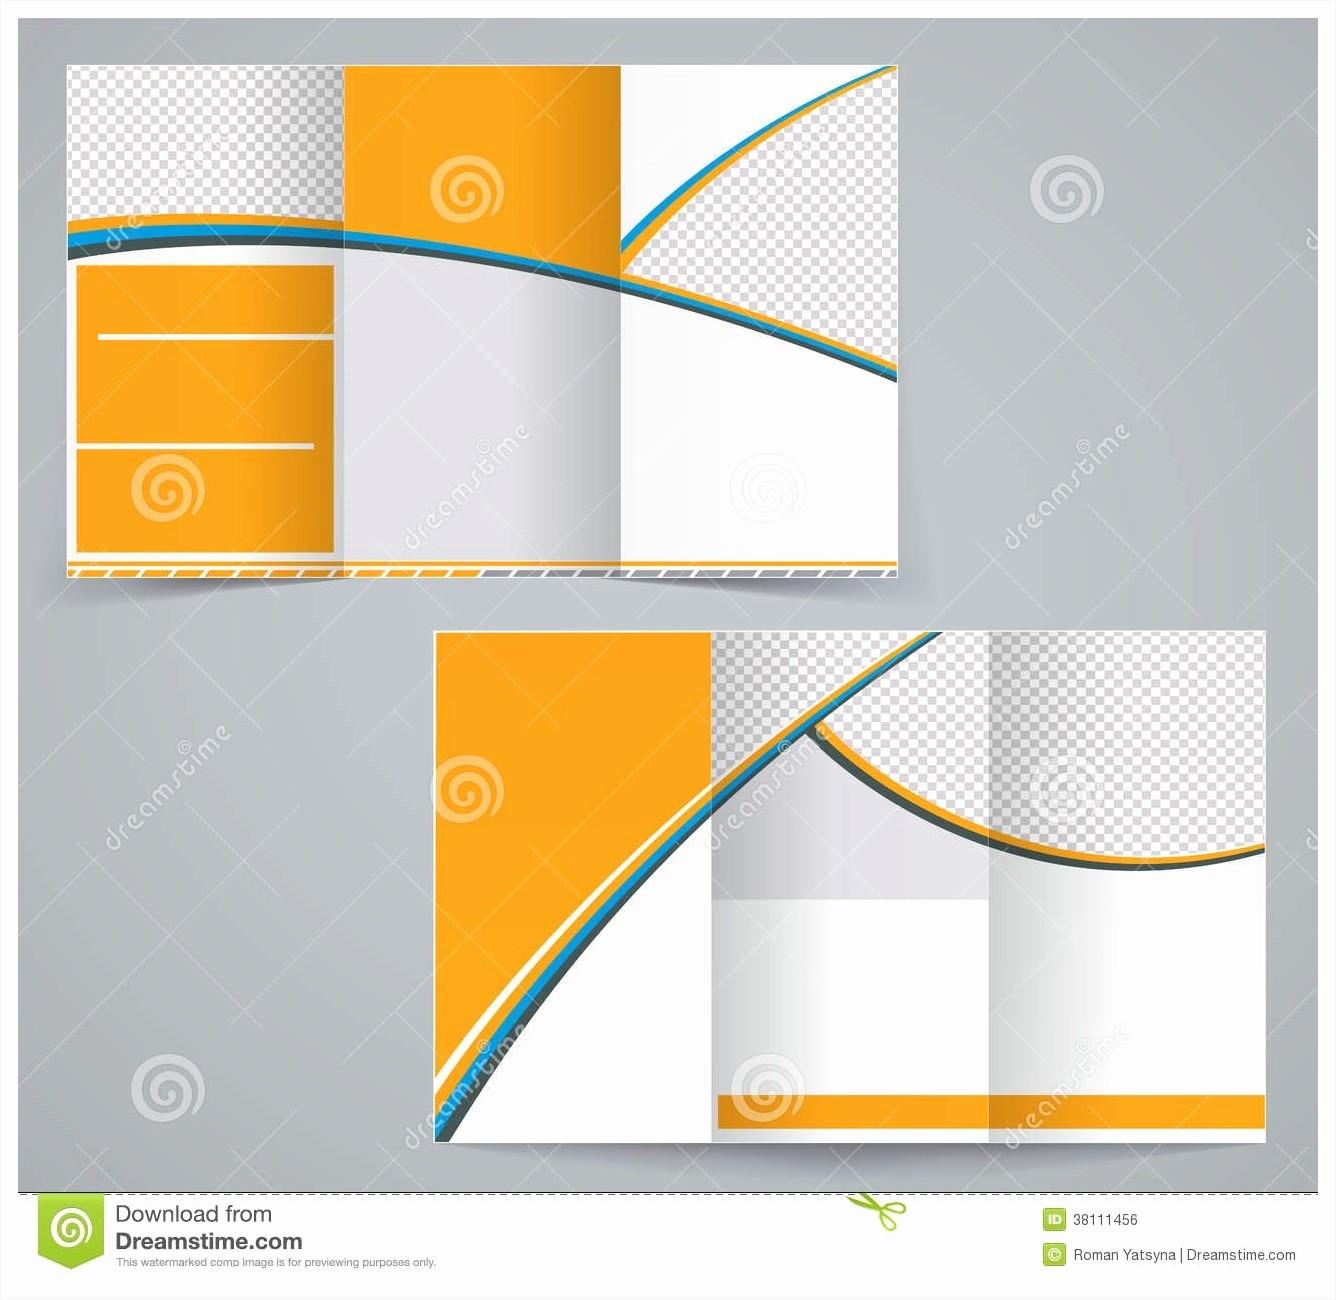 Microsoft Tri Fold Brochure Templates Awesome Blank Brochure Templates Mughals